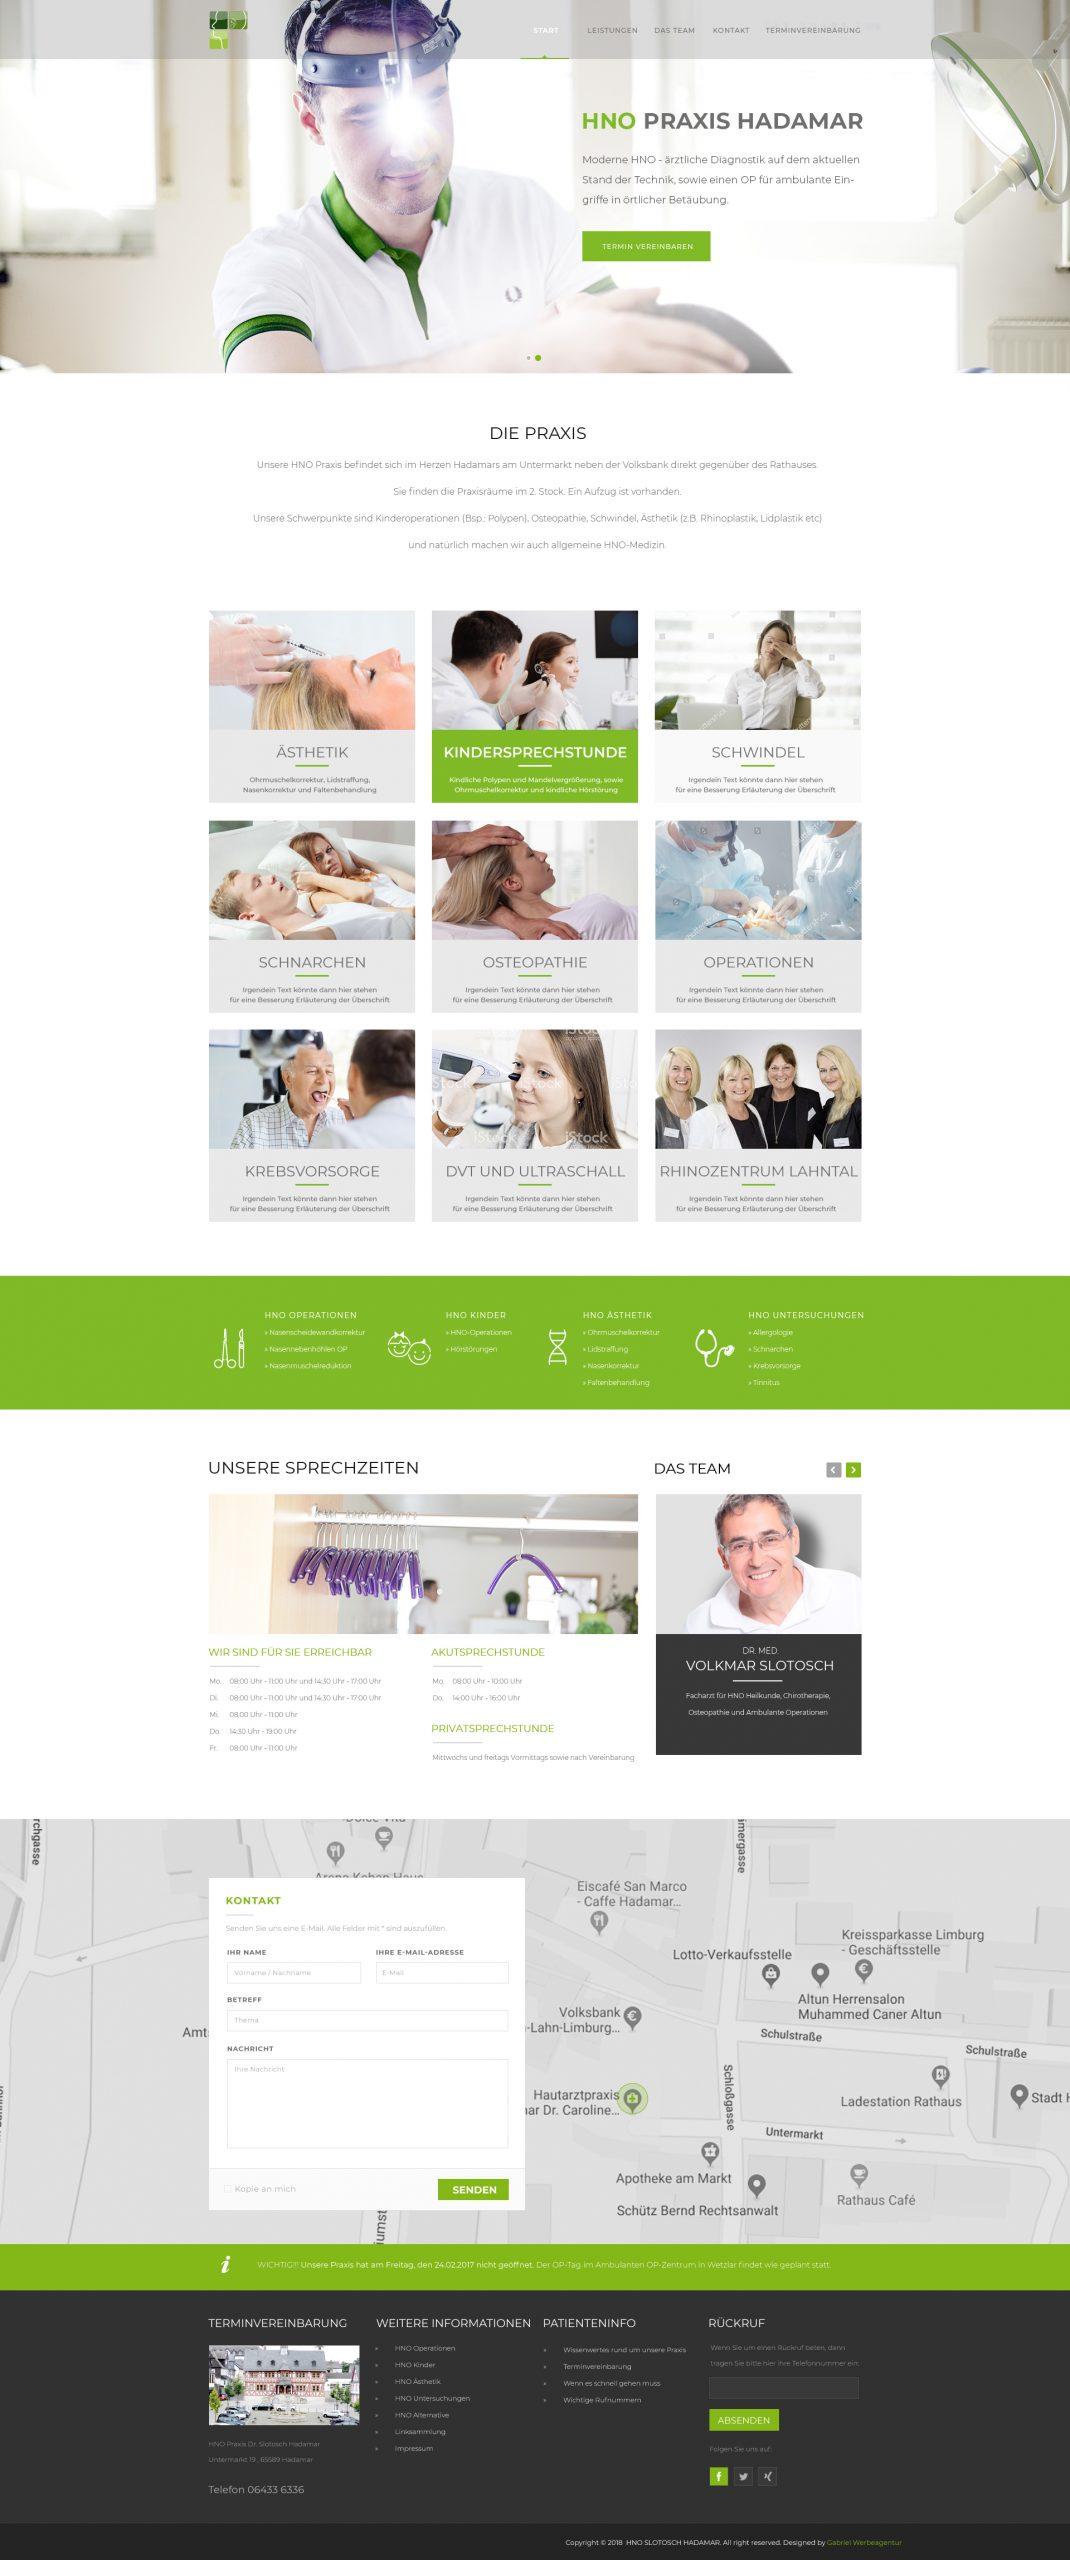 HNO Praxis Hadamar Website